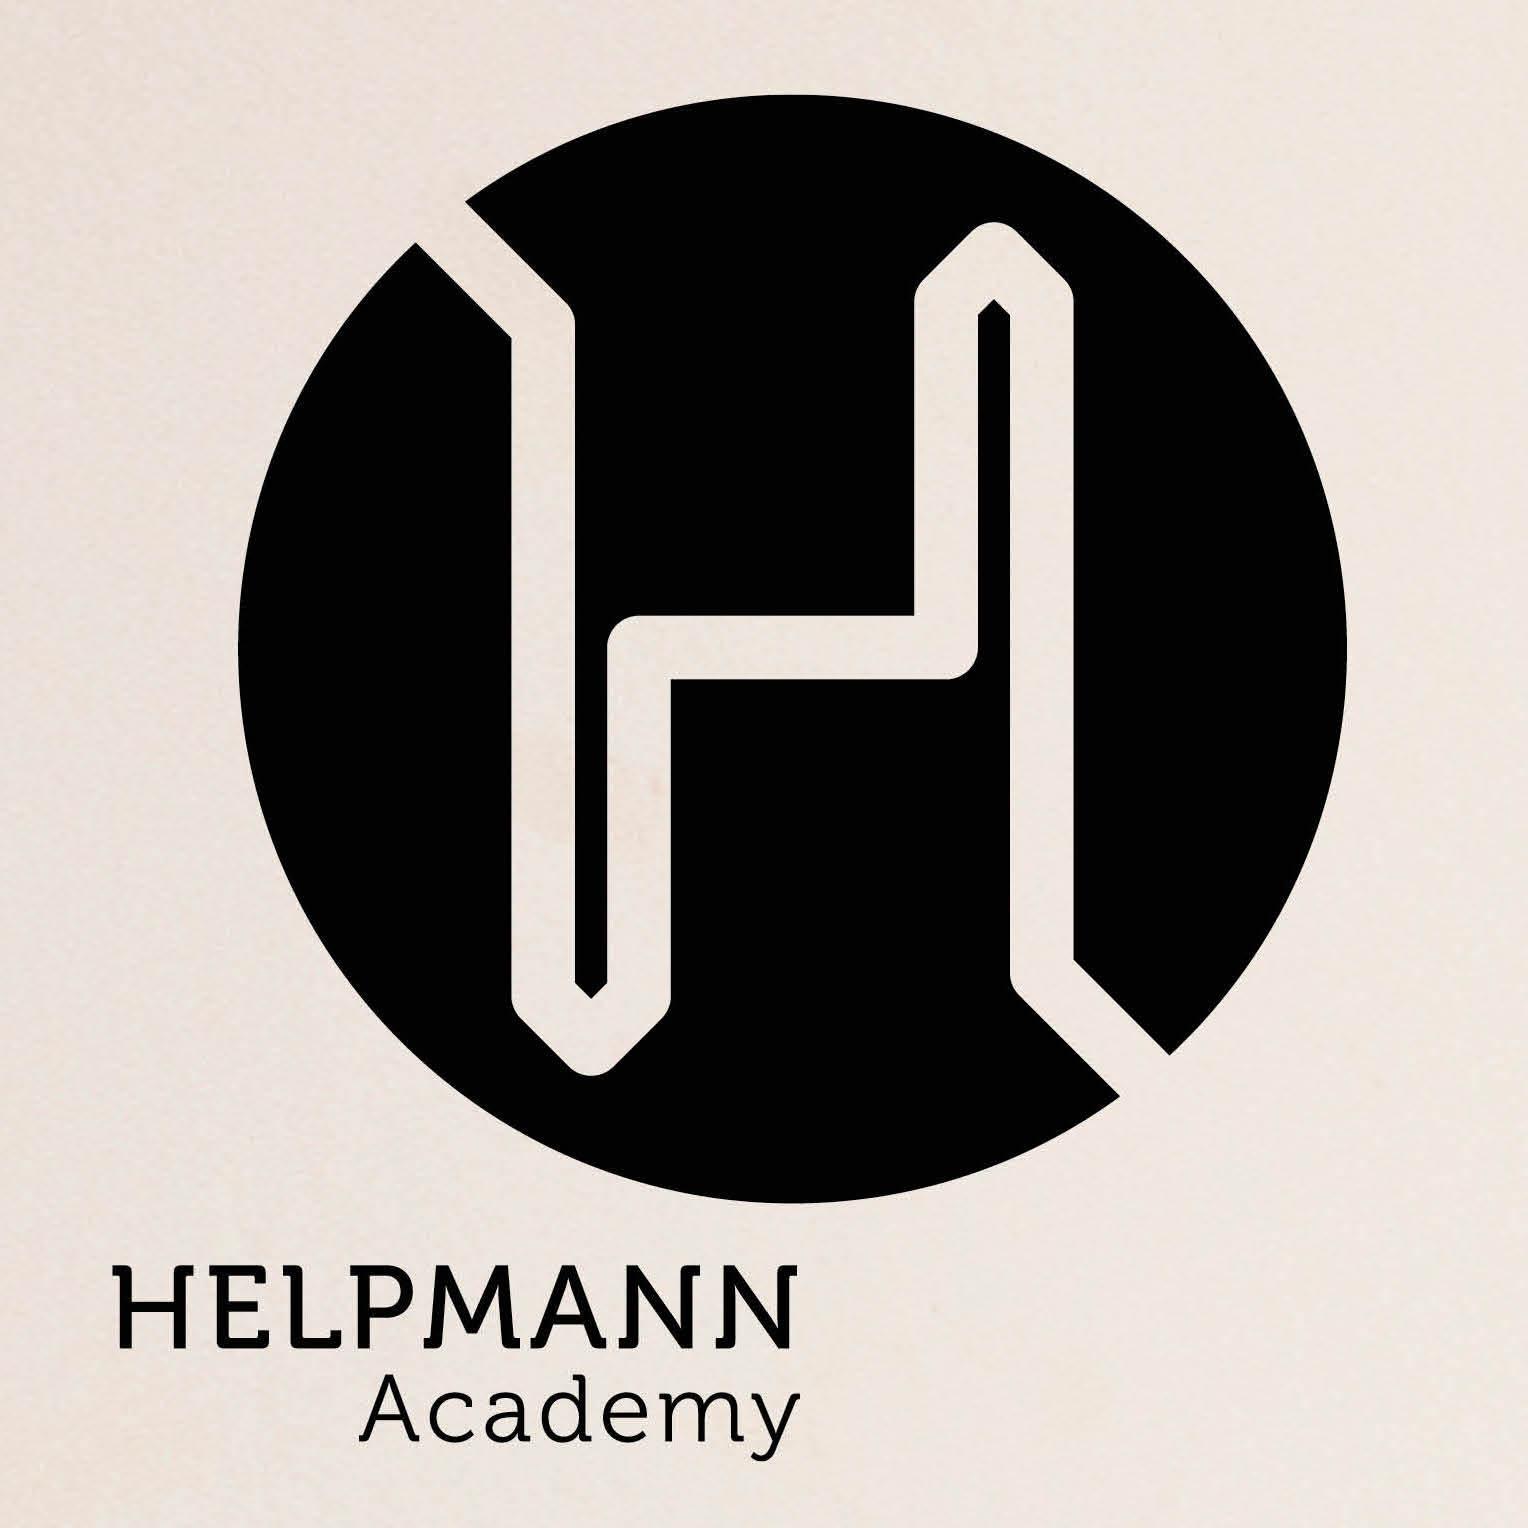 Helpmann logo